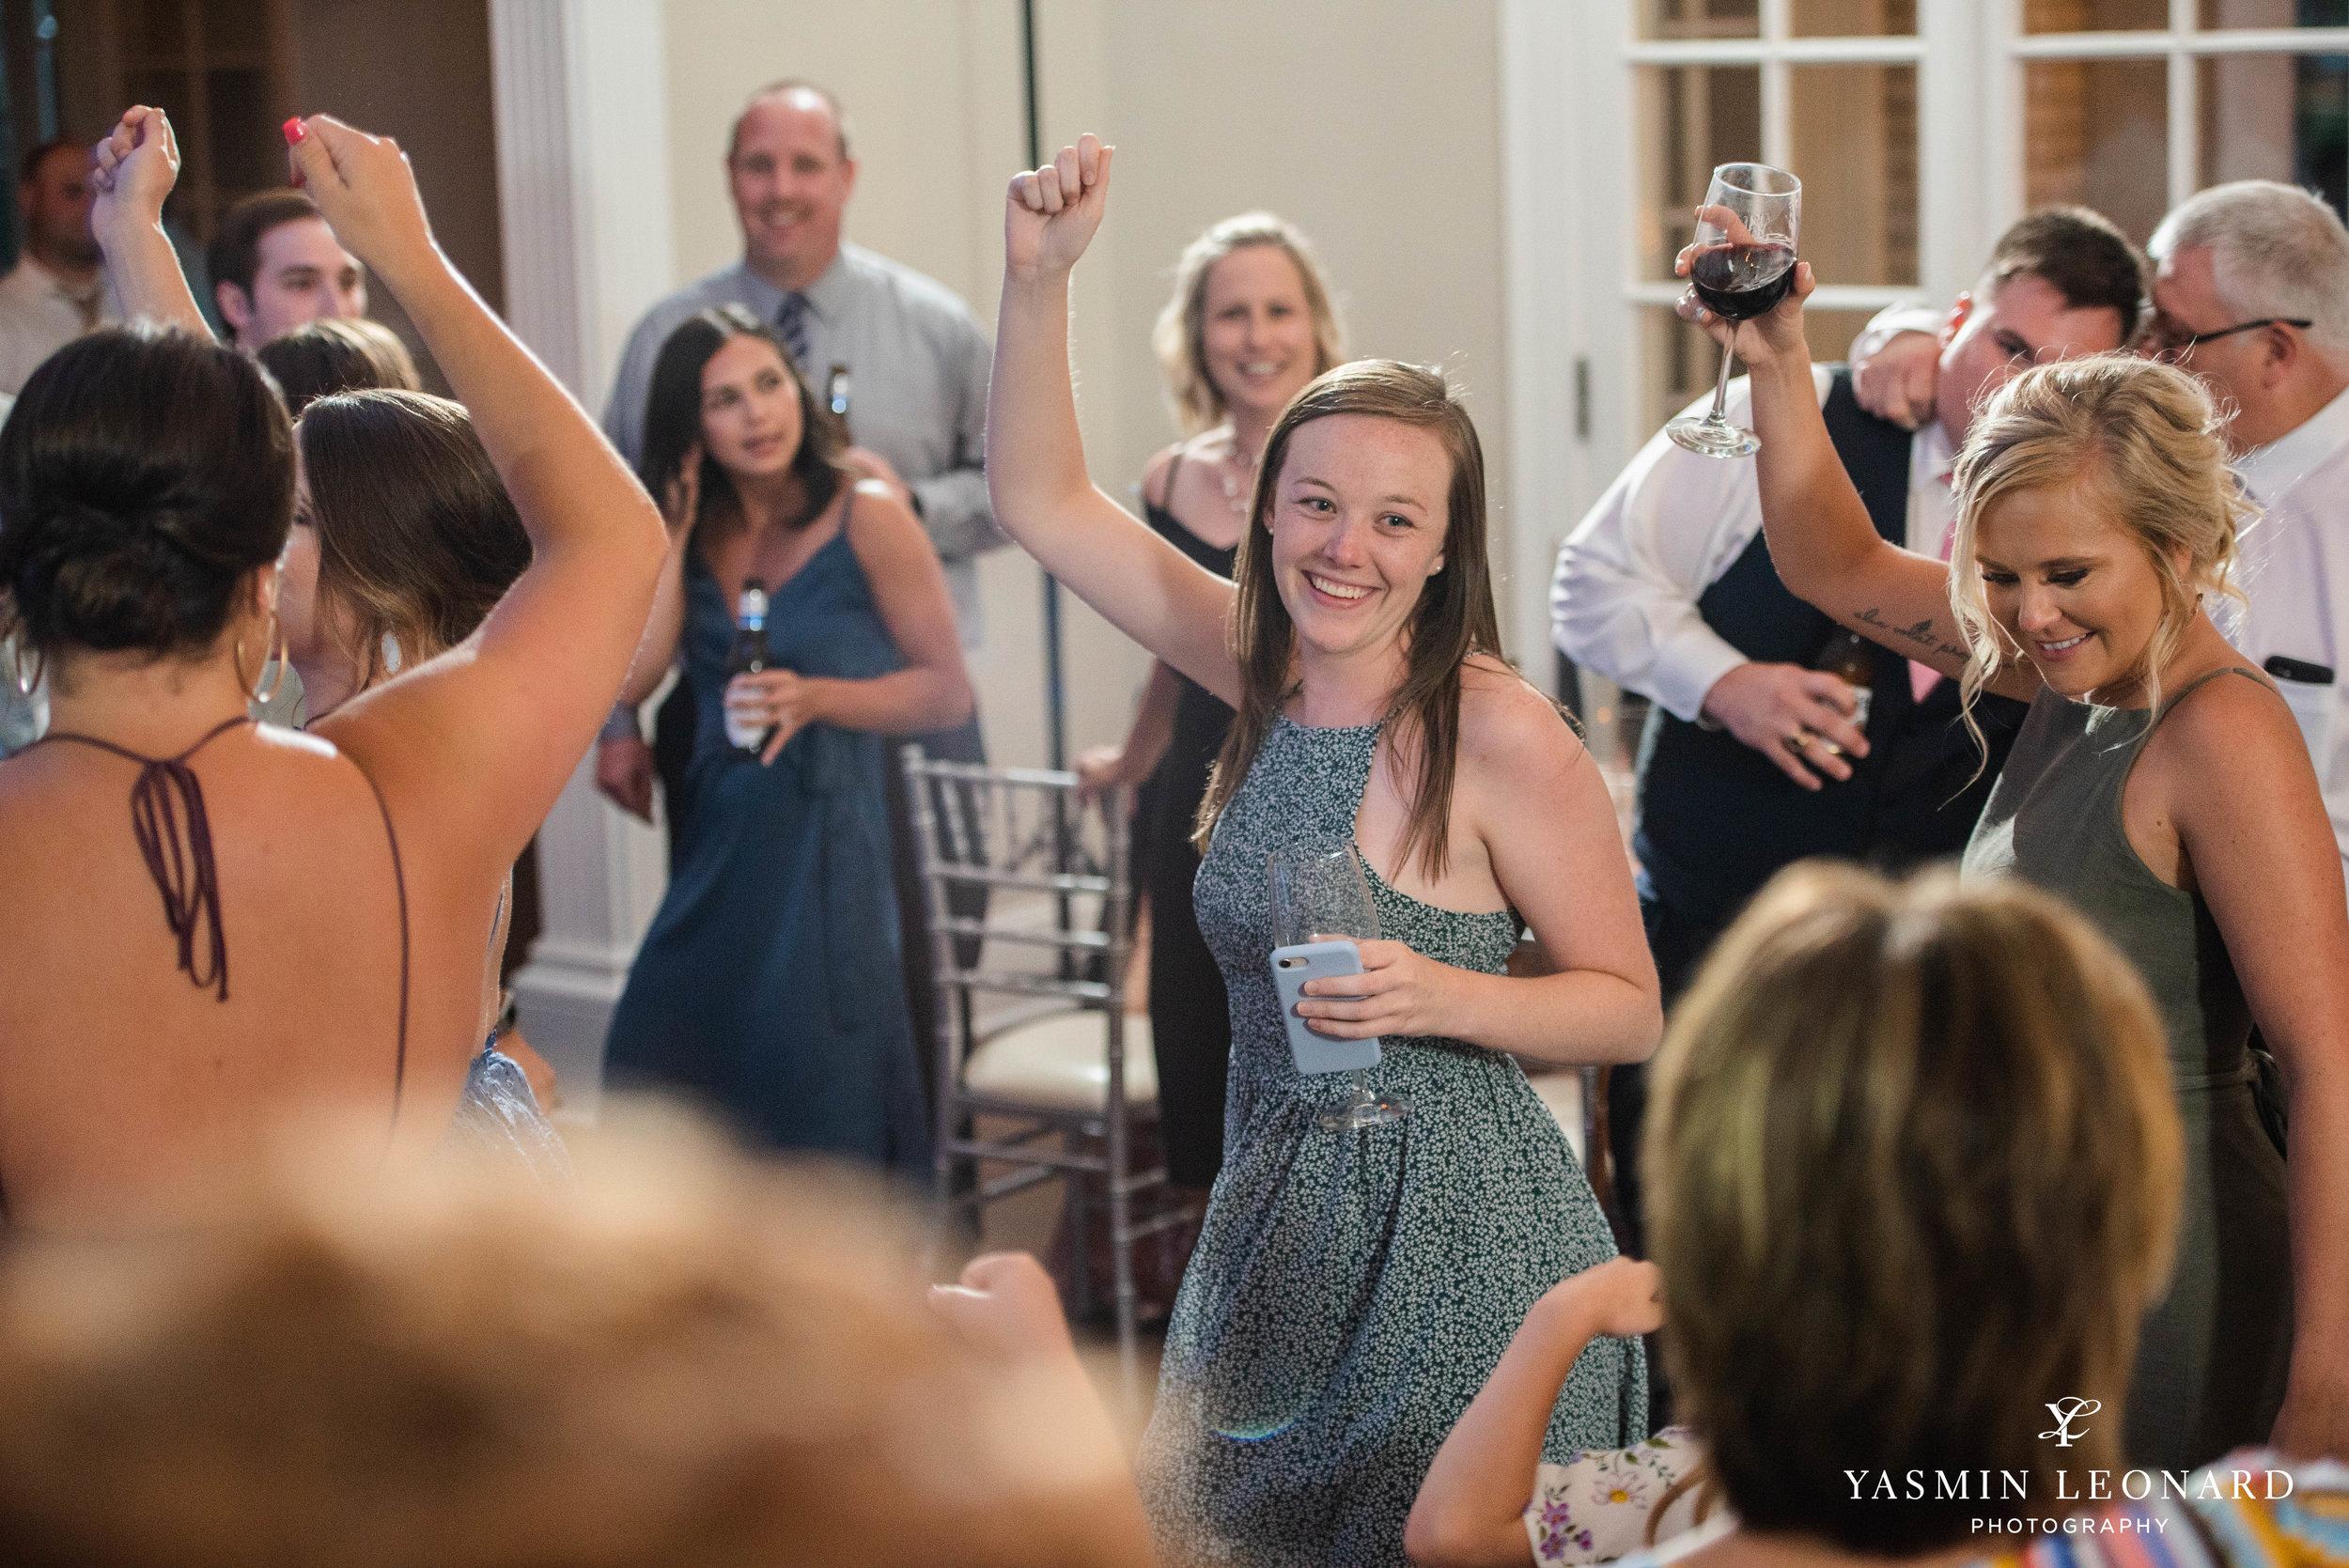 Separk Mansion - NC Weddings - Gastonia Wedding - NC Wedding Venues - Pink and Blue Wedding Ideas - Pink Bridesmaid Dresses - Yasmin Leonard Photography-60.jpg